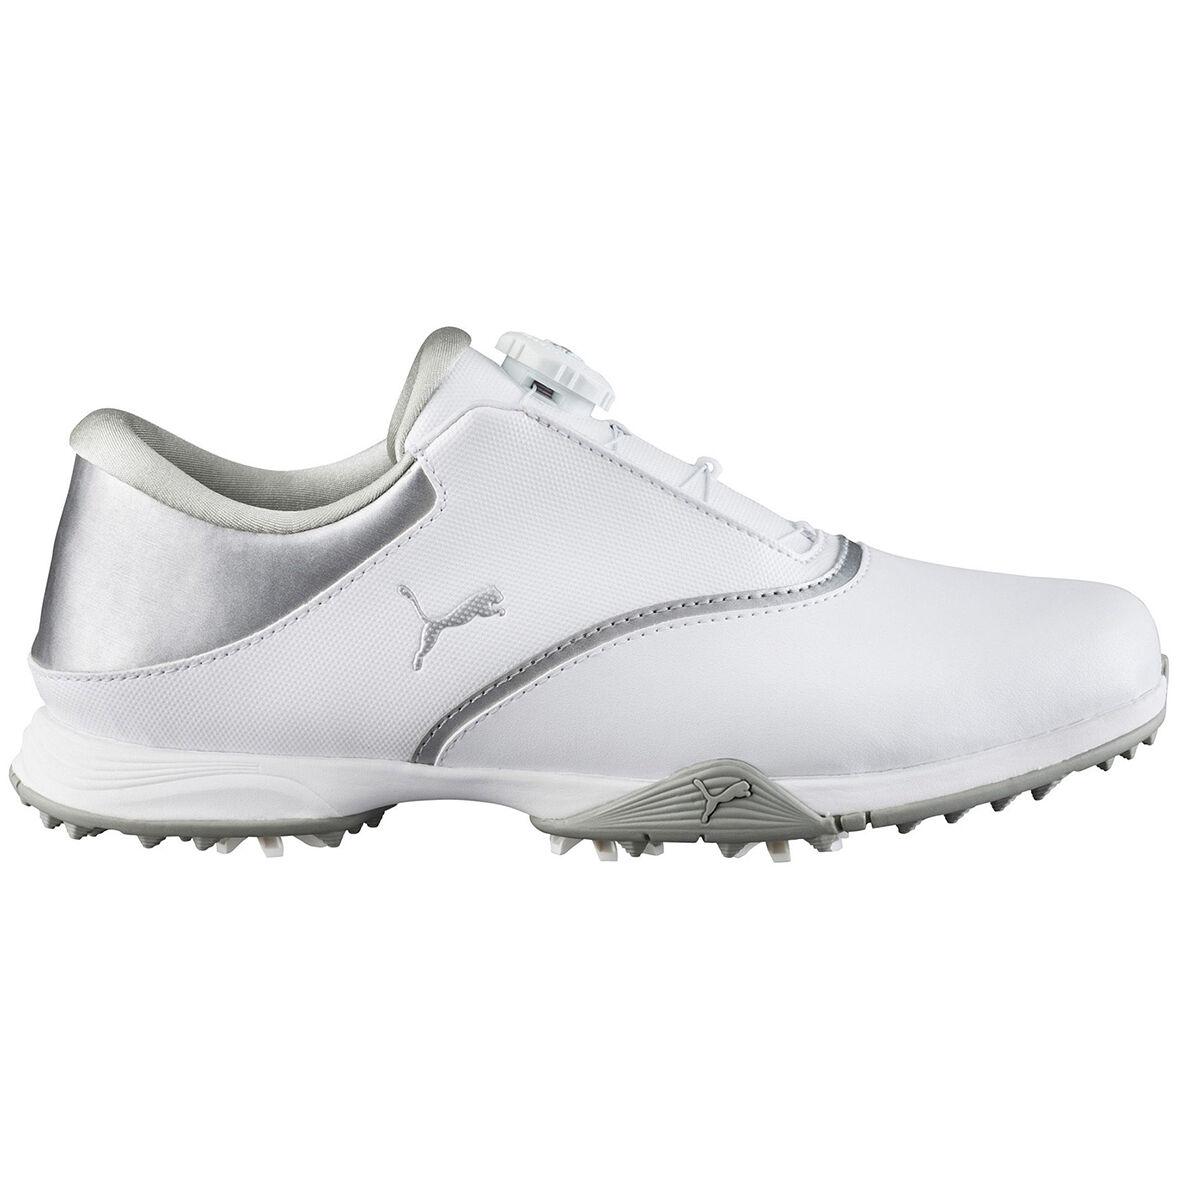 Chaussures de Golf PUMA Blaze